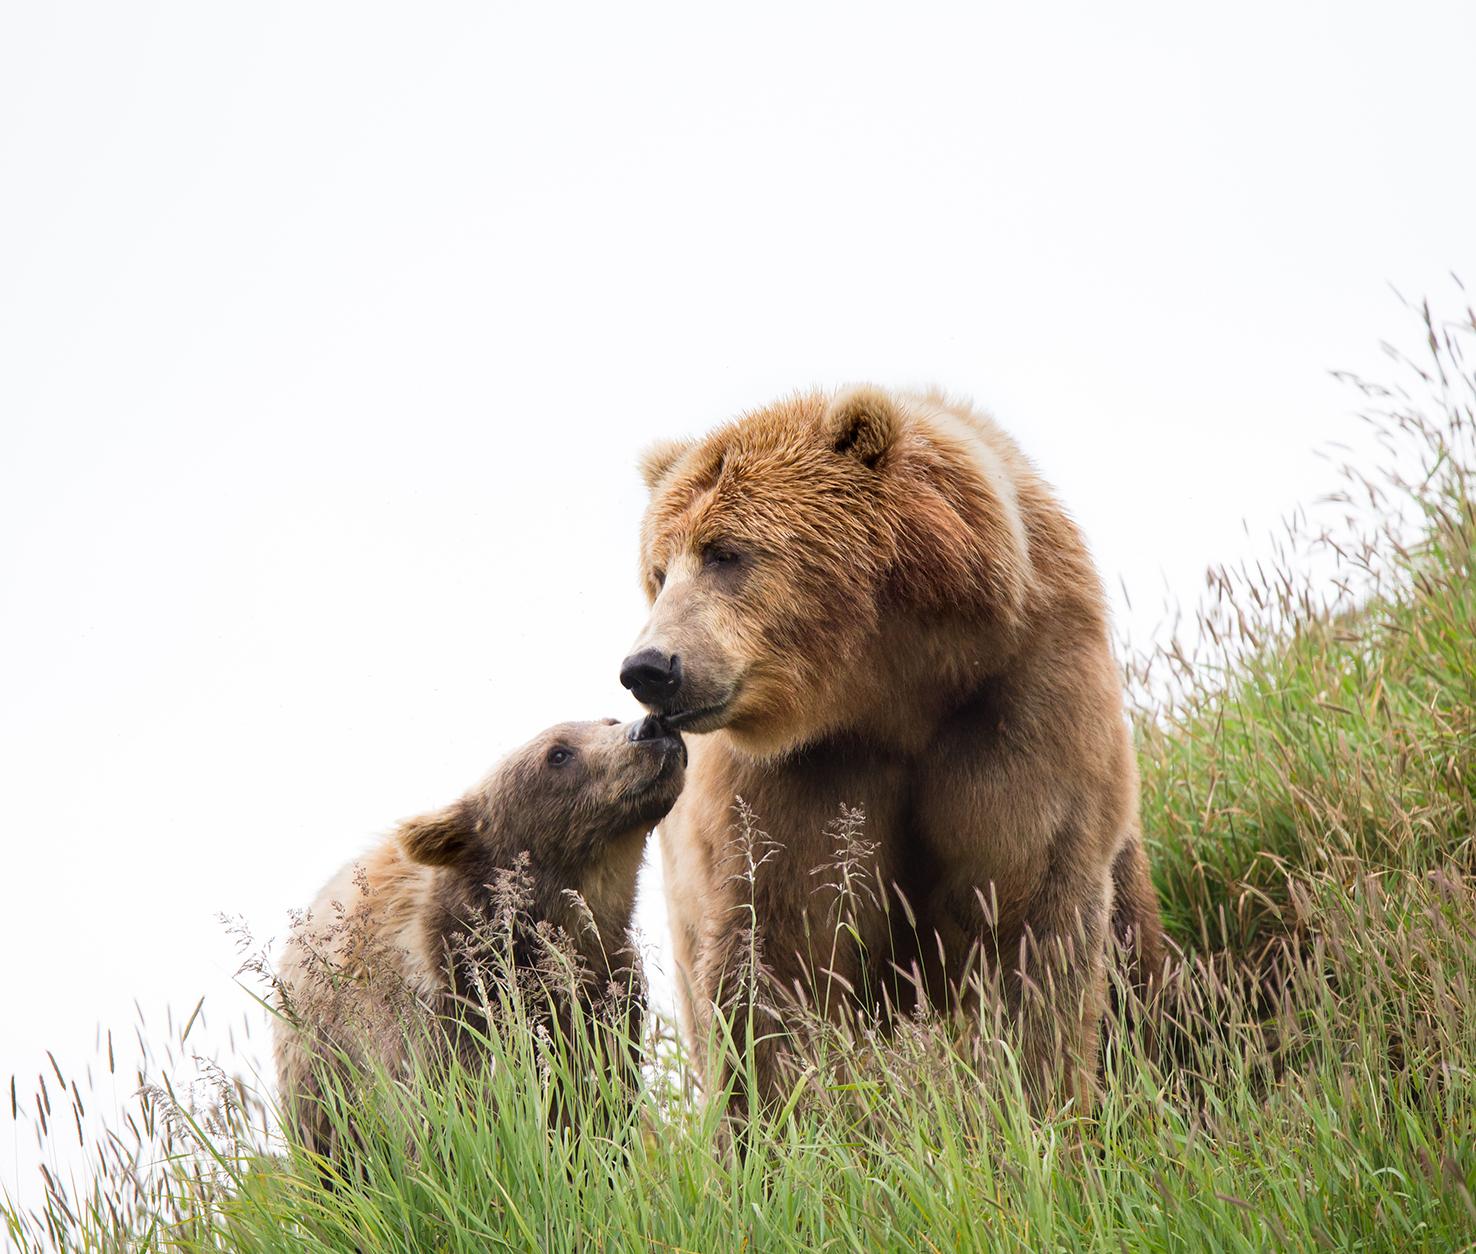 Kodiak bear and cub beautiful picture